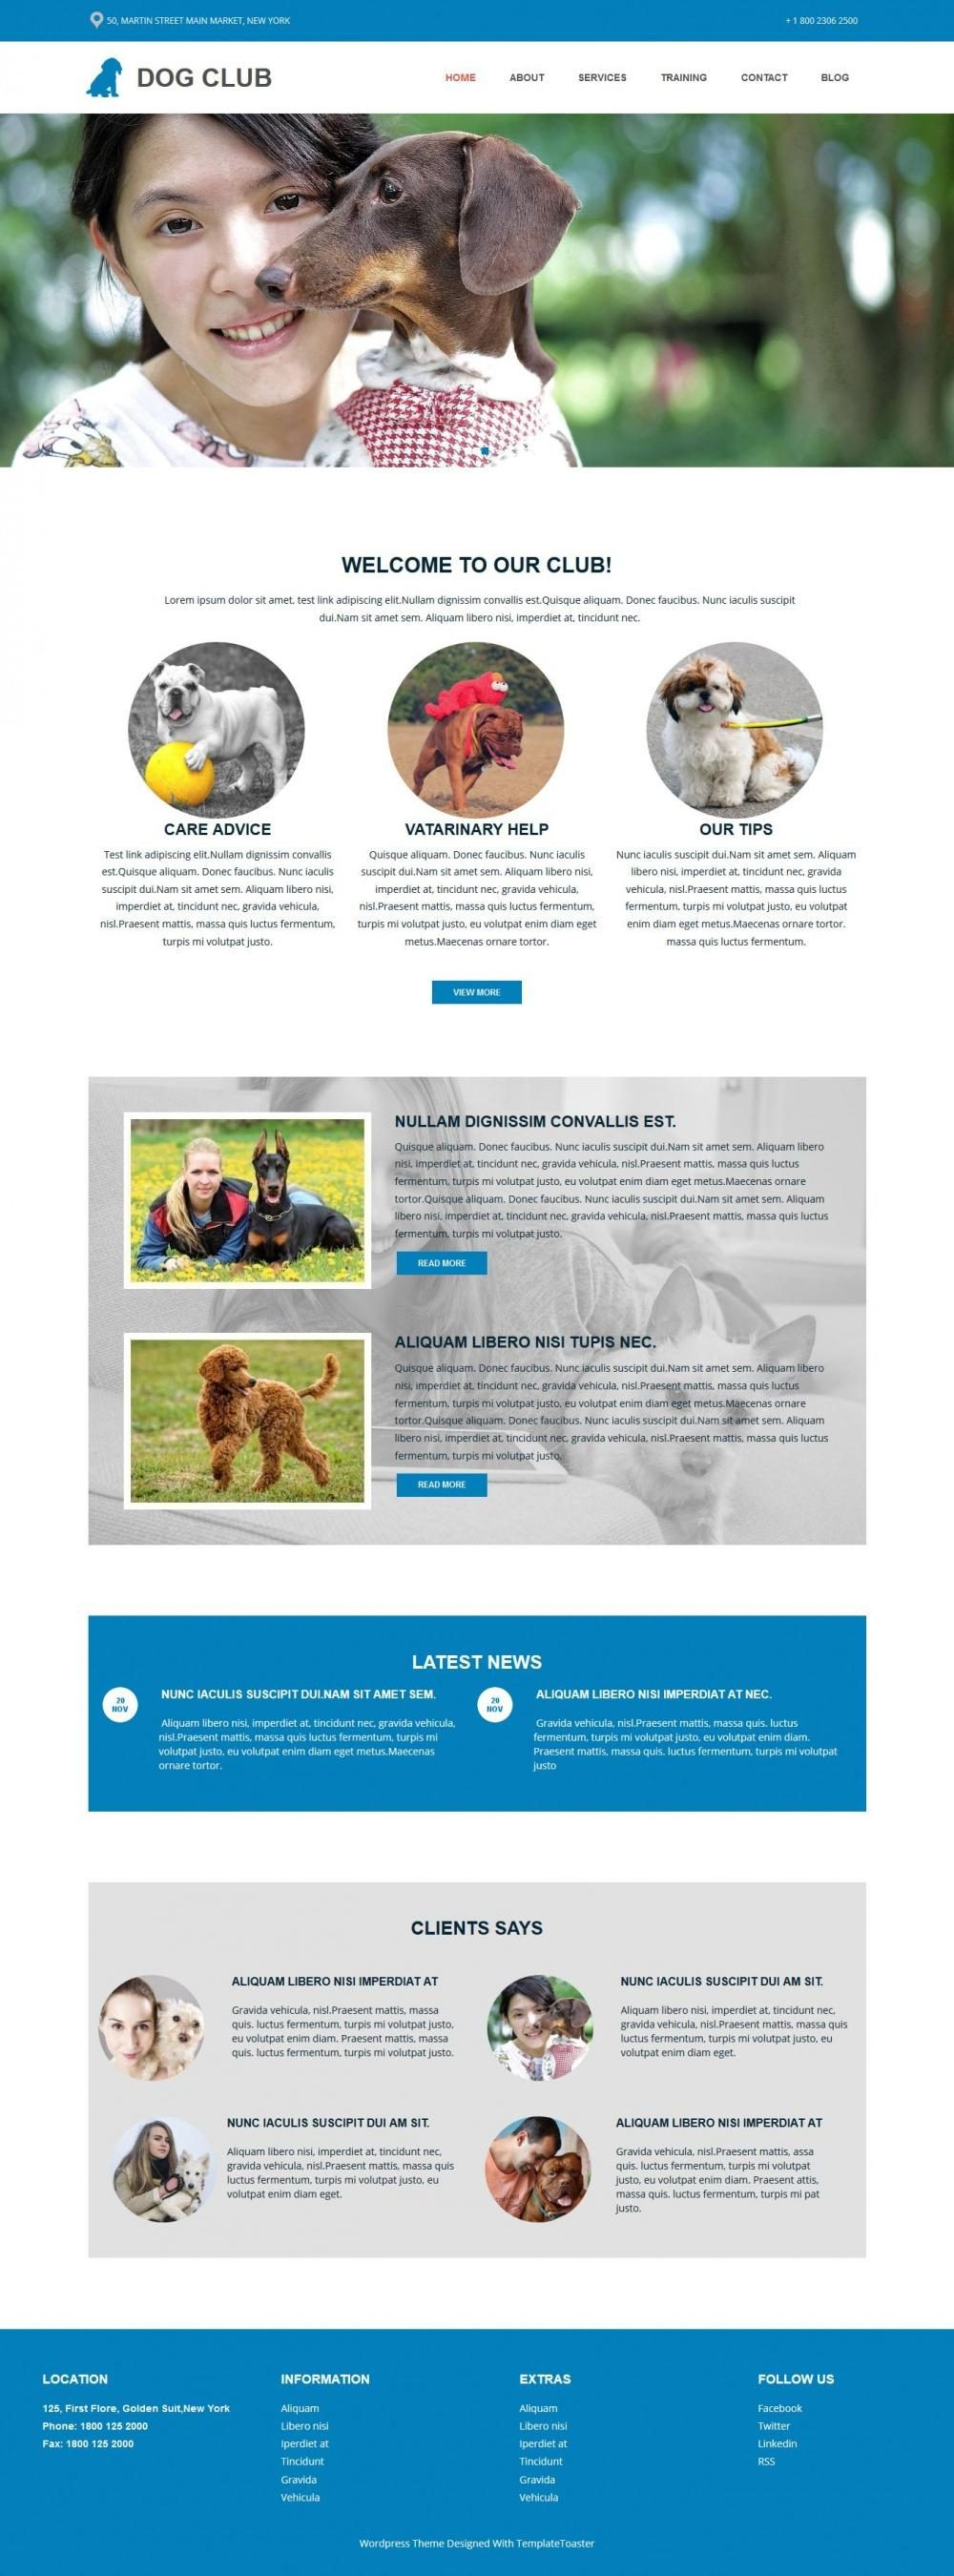 Dog Club - WordPress Theme for Dog Club